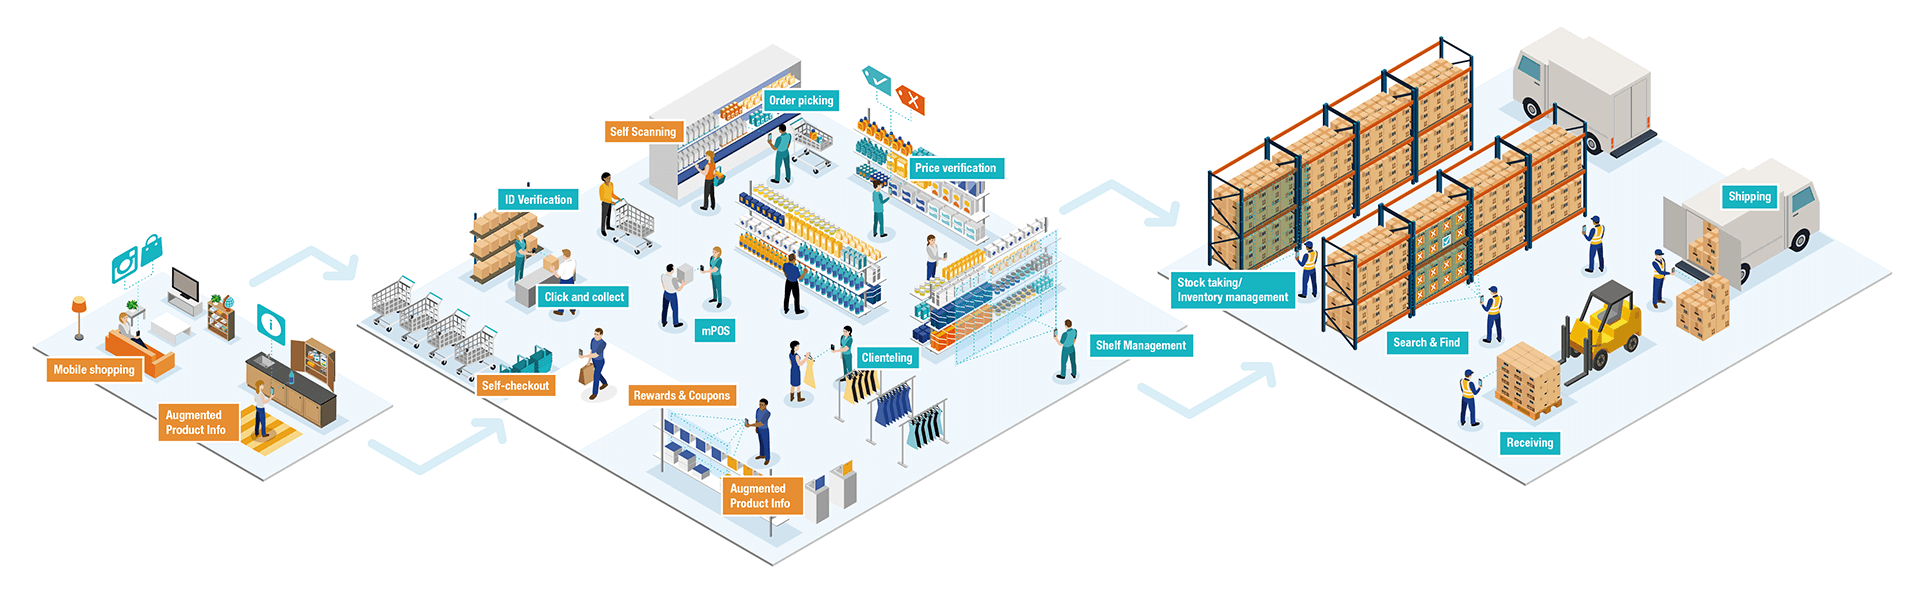 retail eco system diagram